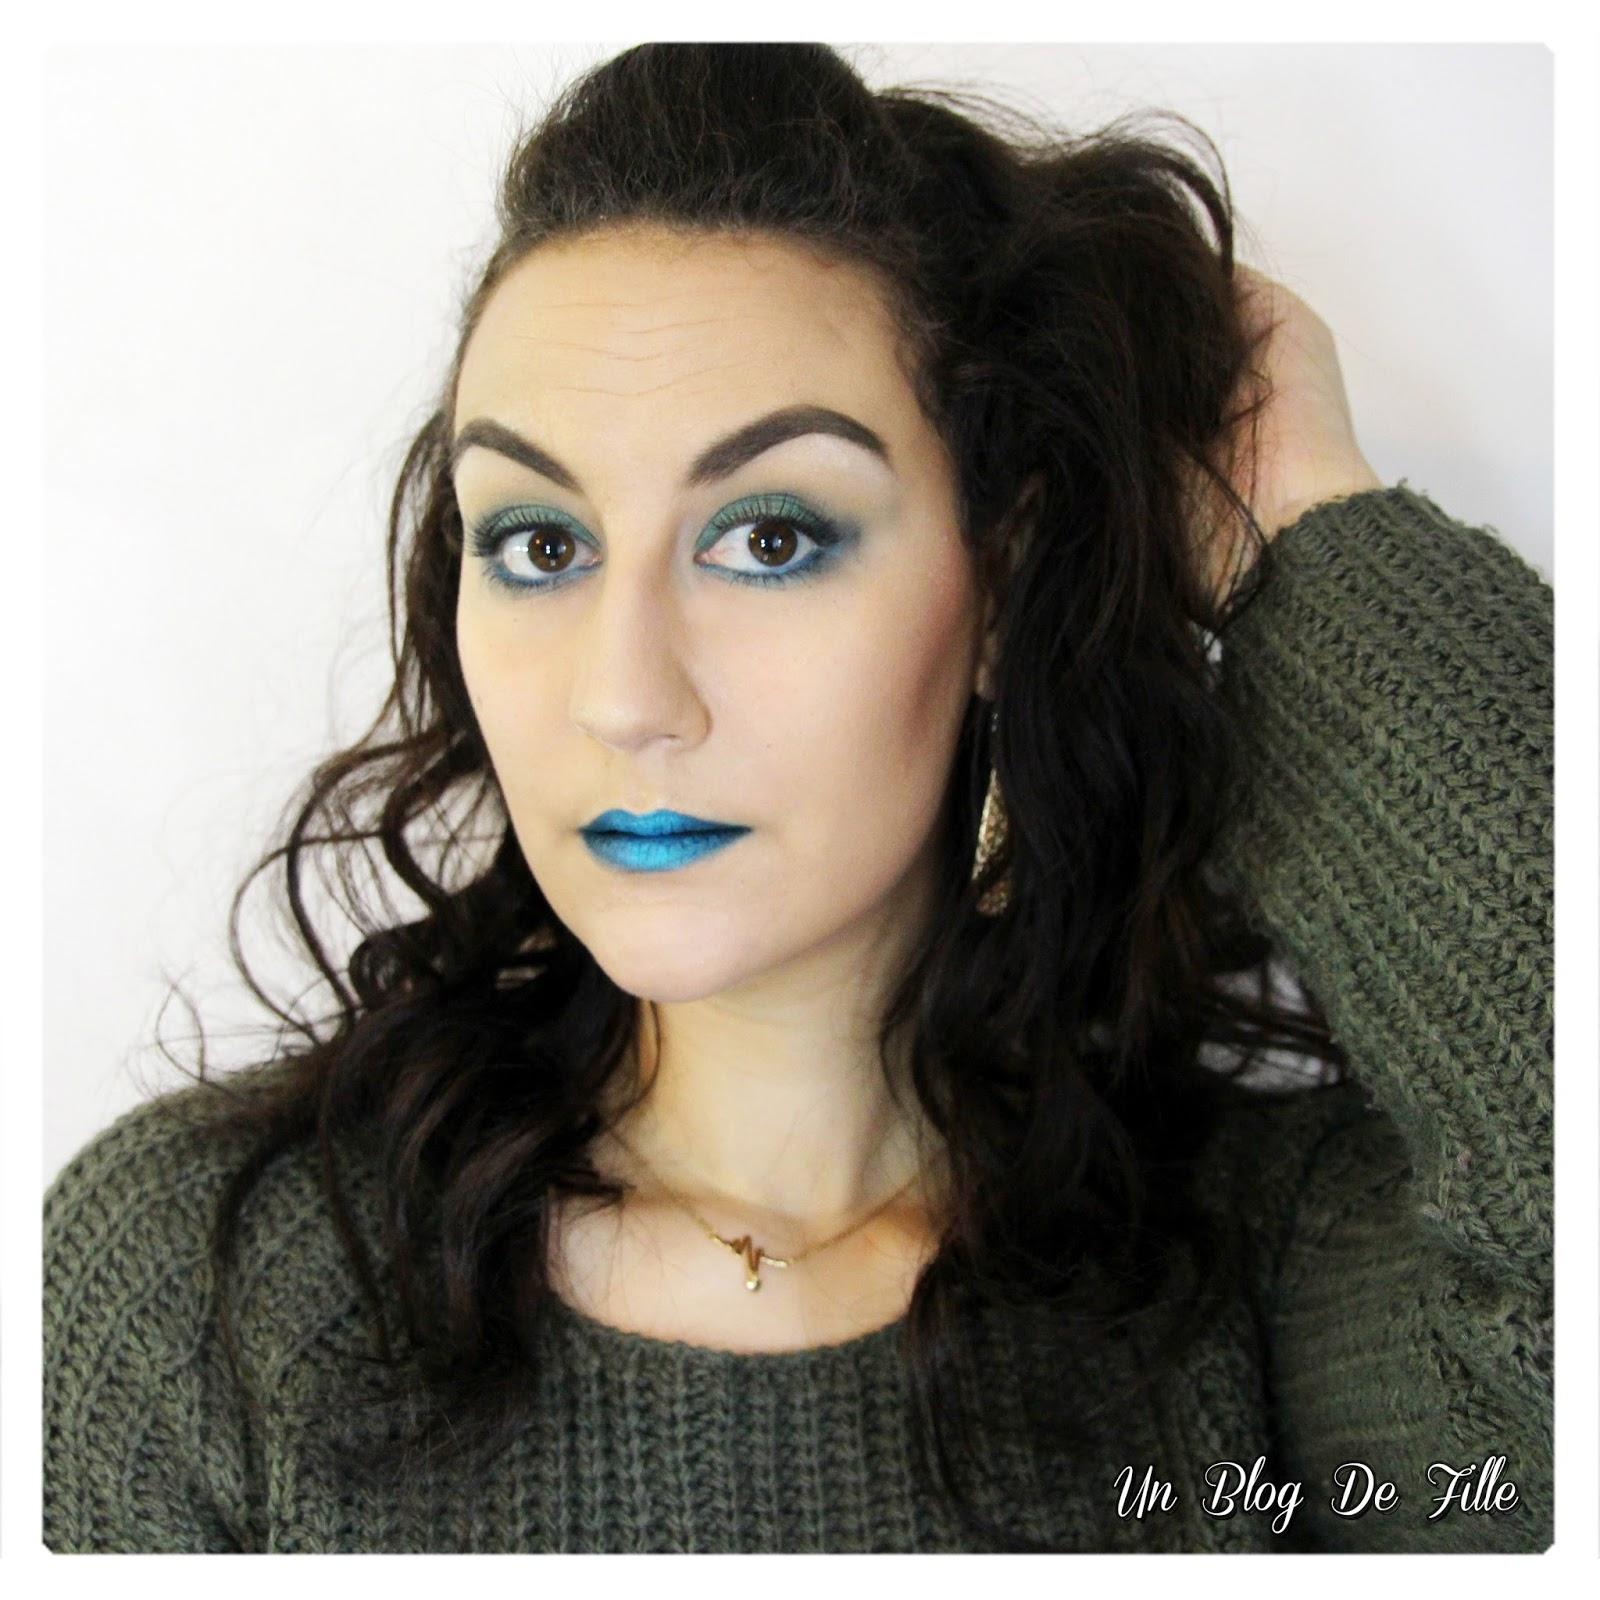 http://unblogdefille.blogspot.fr/2018/01/maquillage-vert-fonce-et-turquoise-msc.html